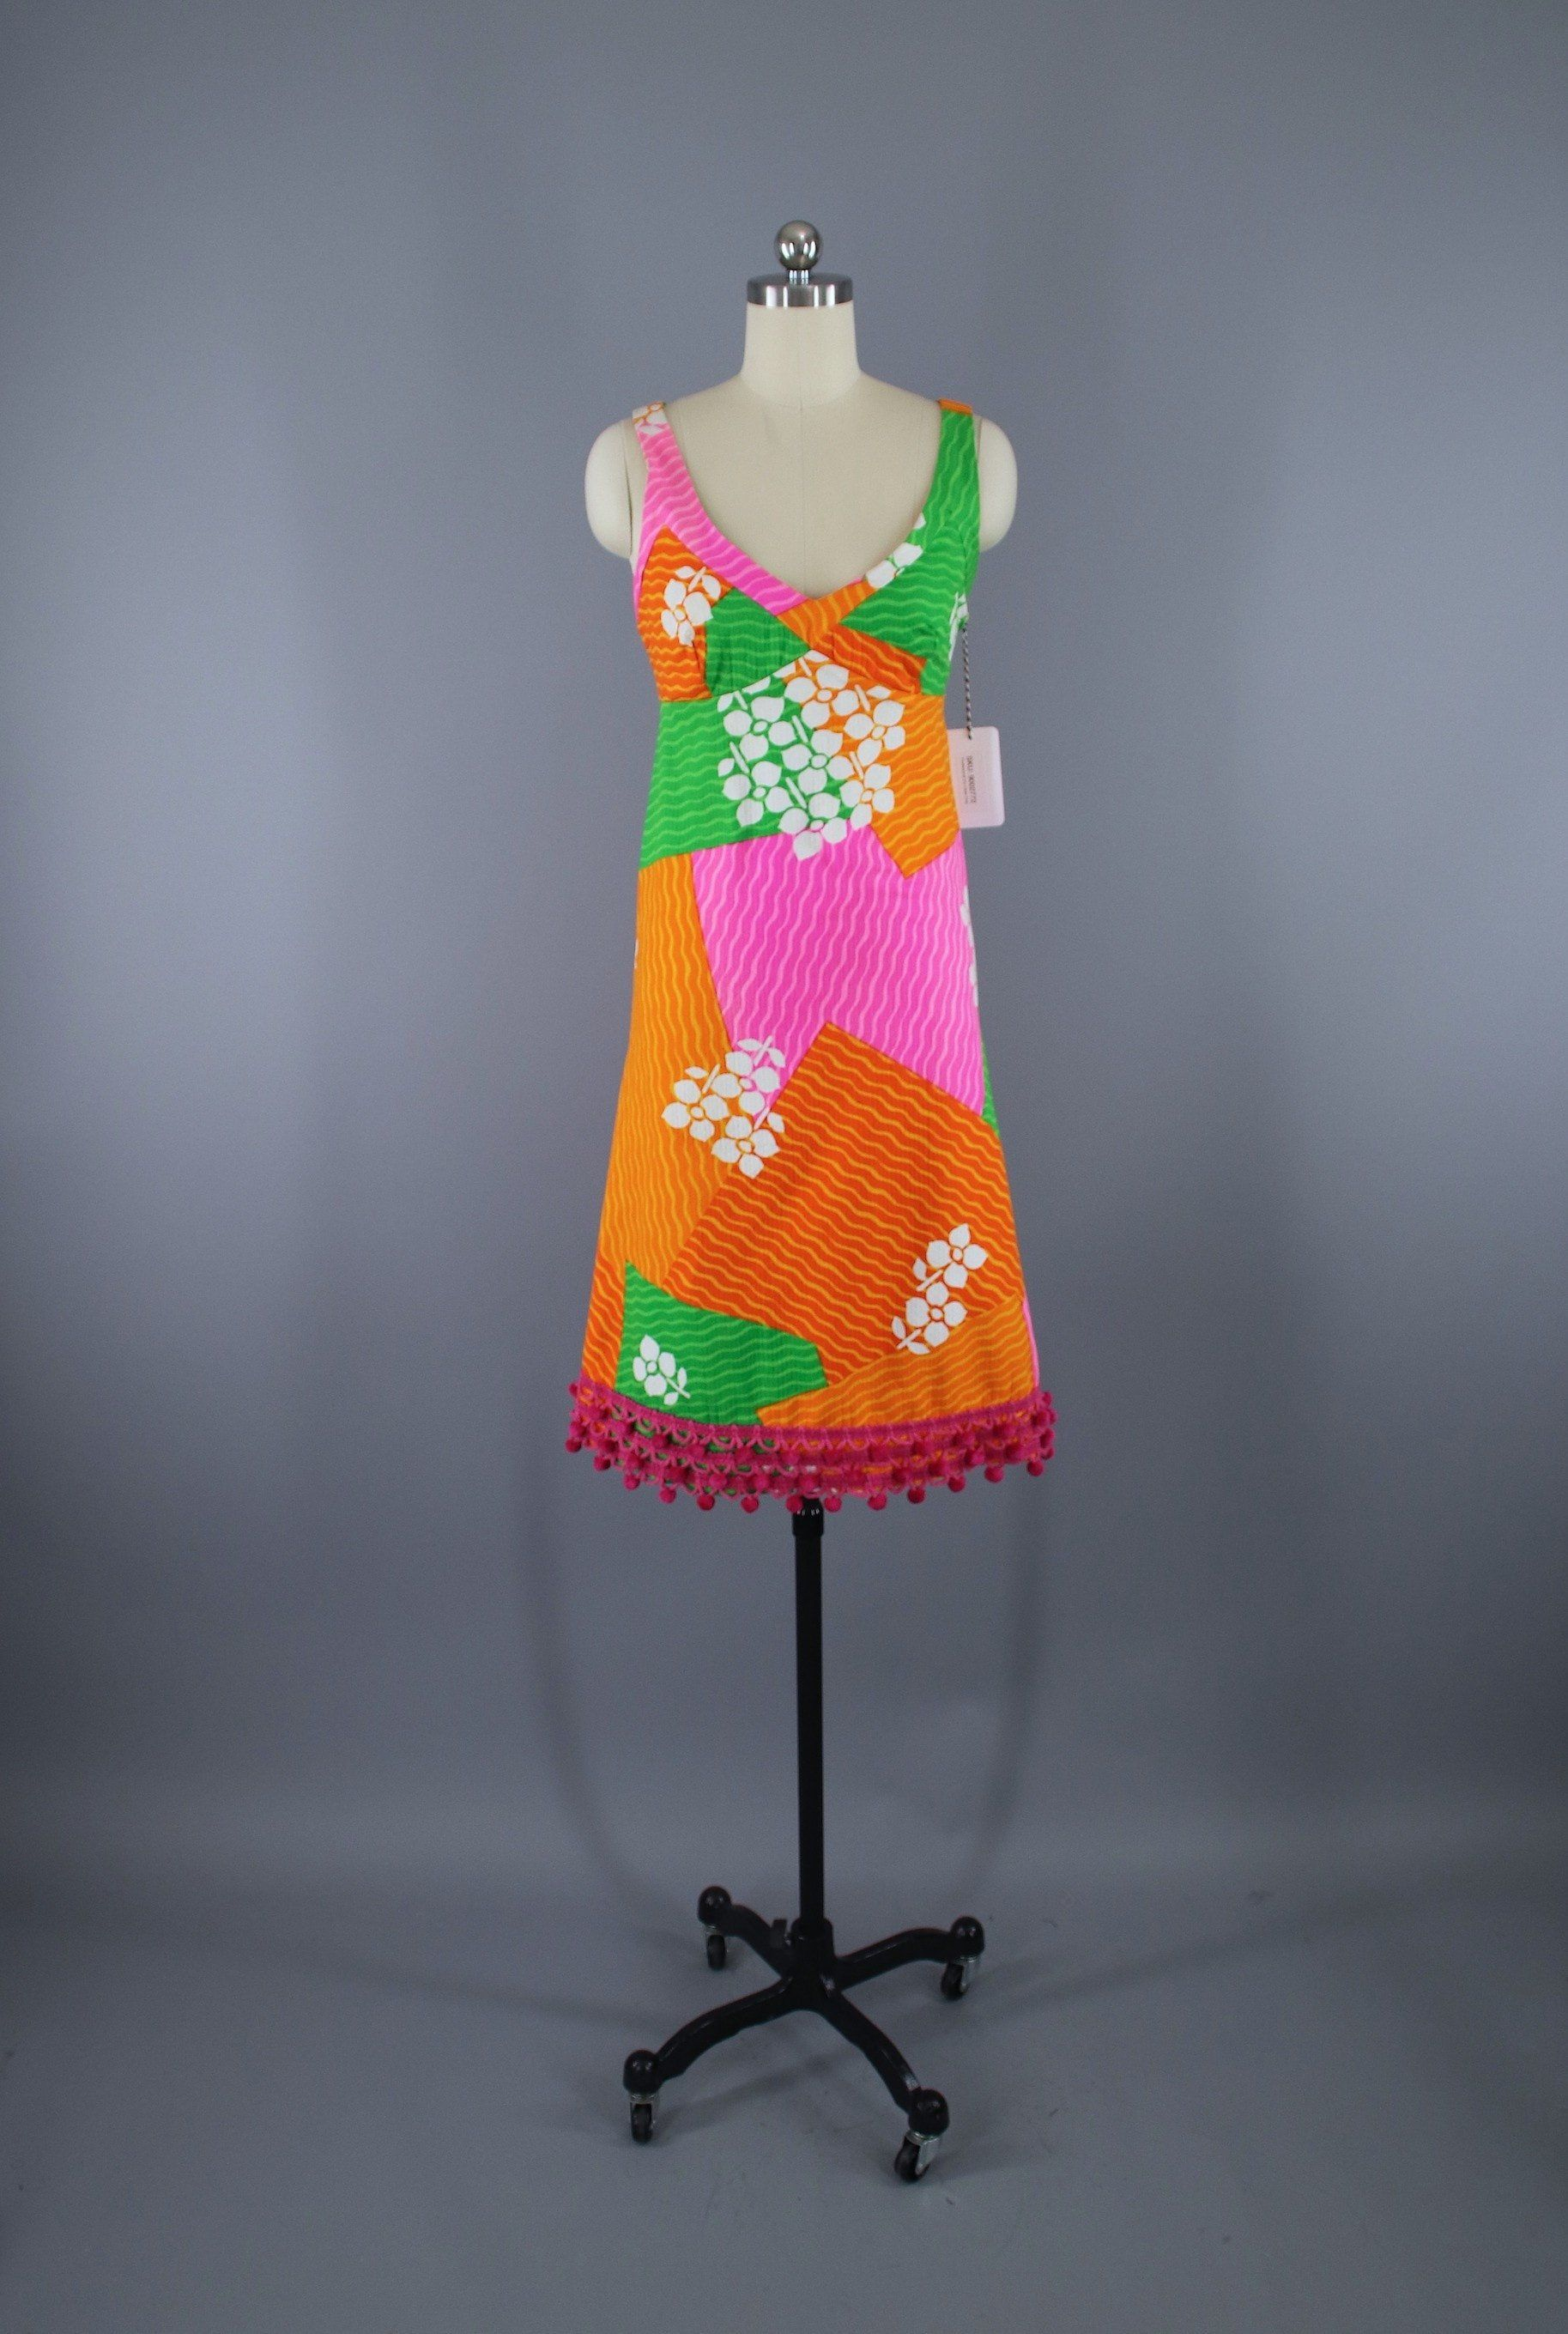 e8790ad0154 Vintage 1960s Hawaiian Print Dress   Malia Hawaii thisbluebird.com  dress   dresses  vintagedress  vintage  vintagedresses  daydress  fashion   vintagefashion ...